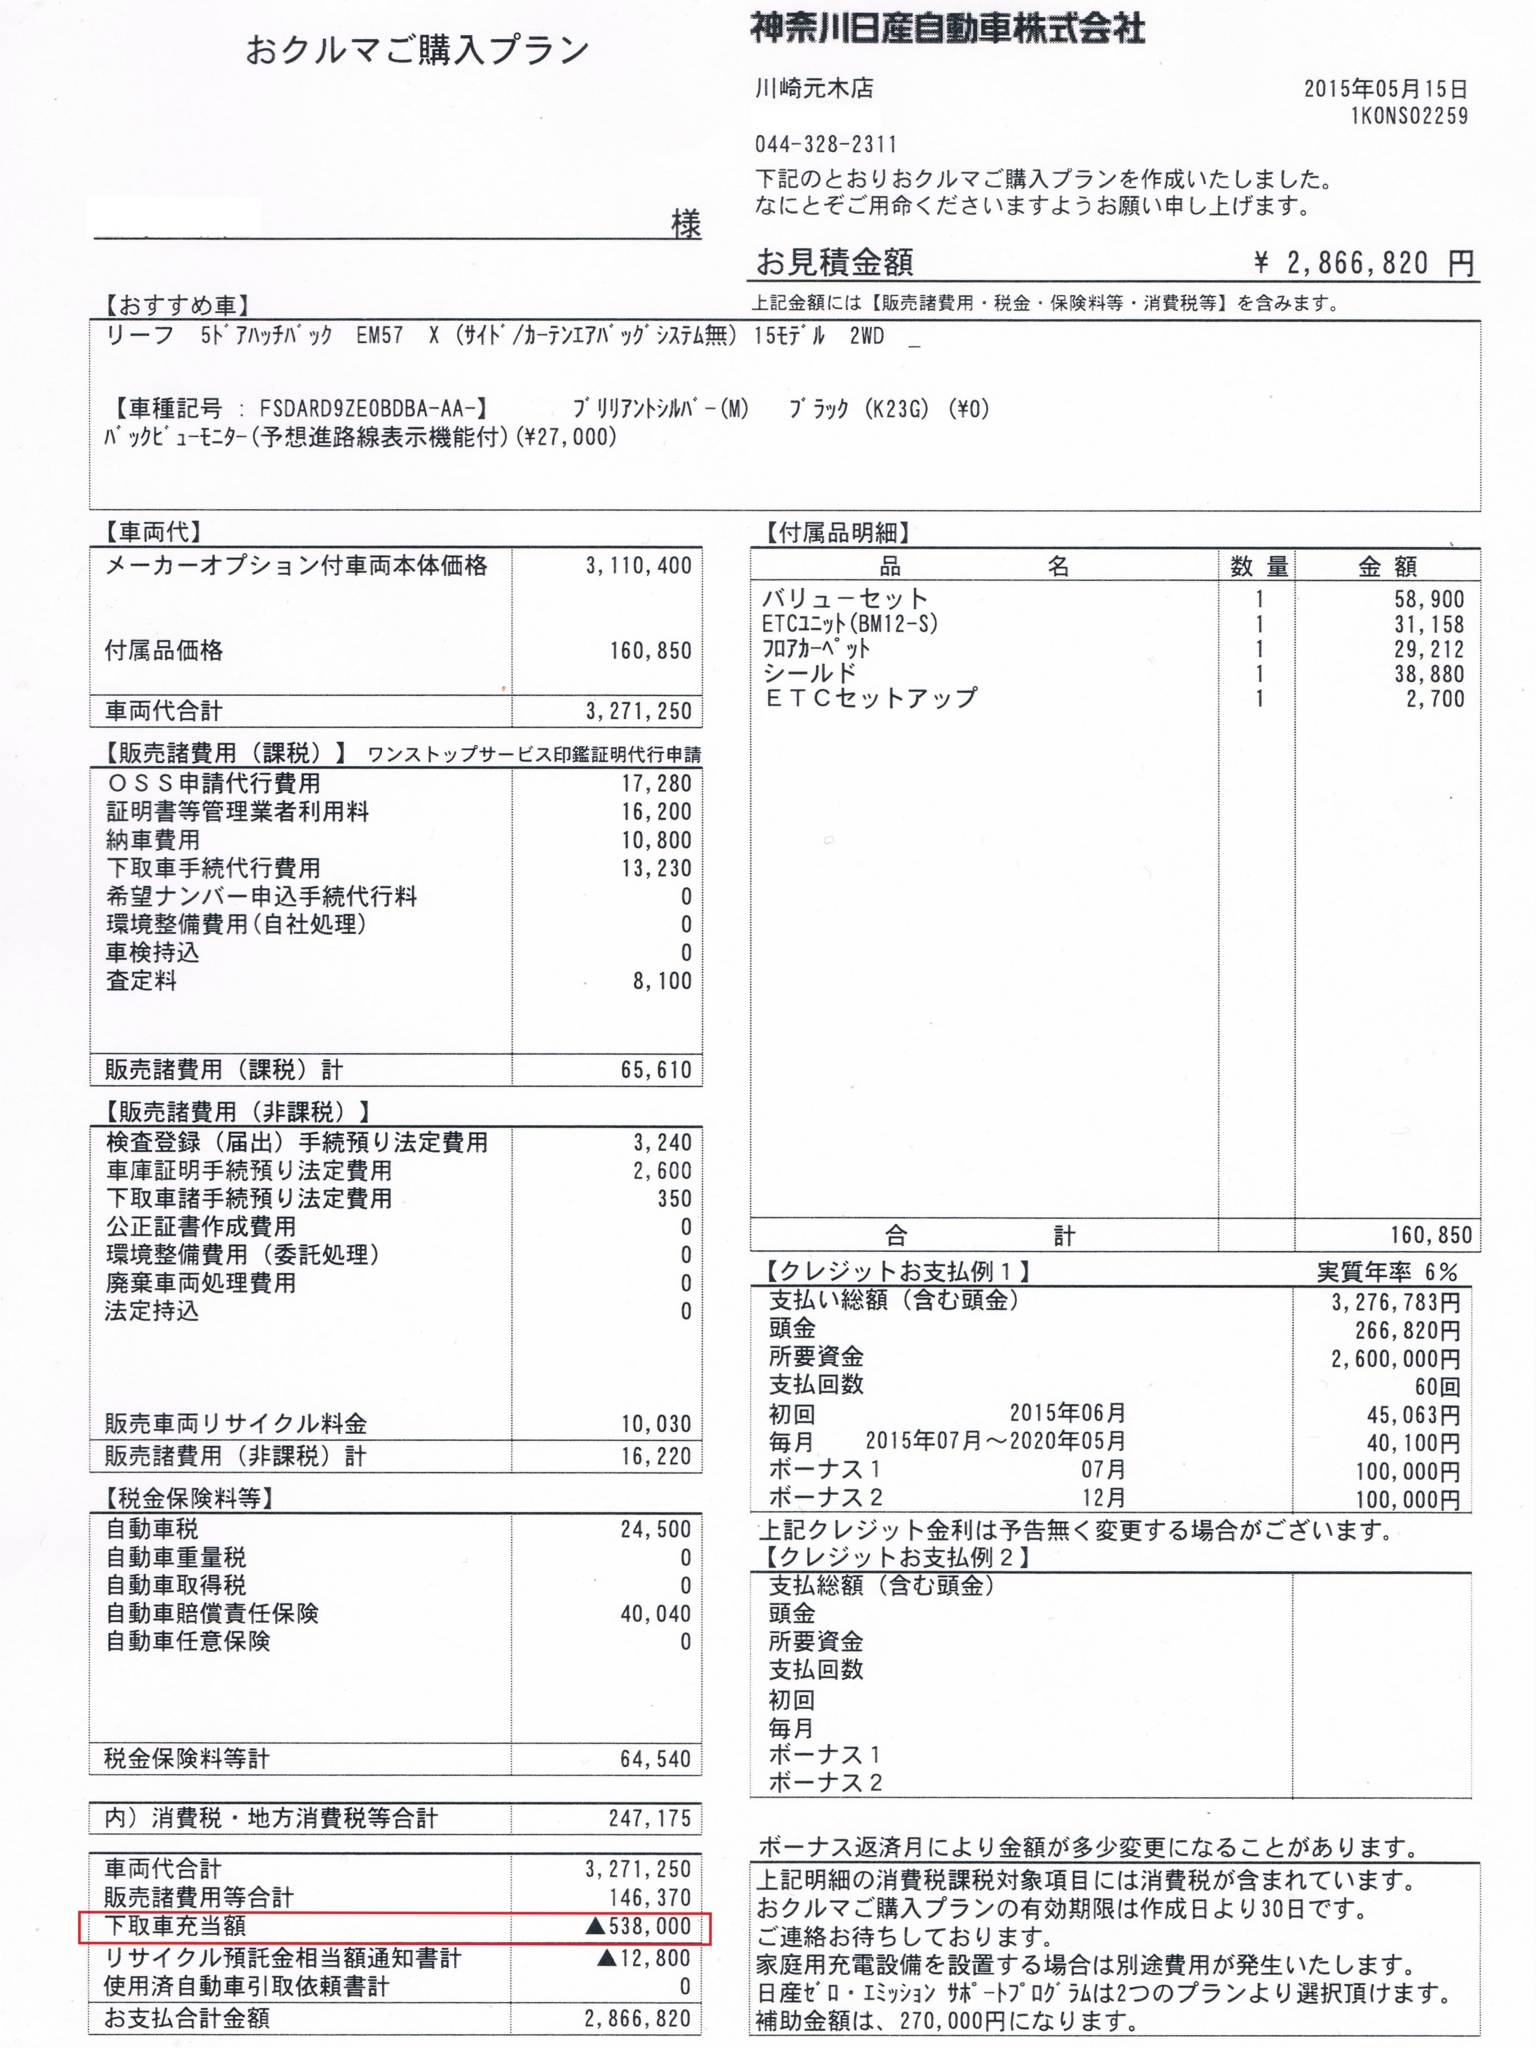 f:id:ToshUeno:20150516000000j:plain